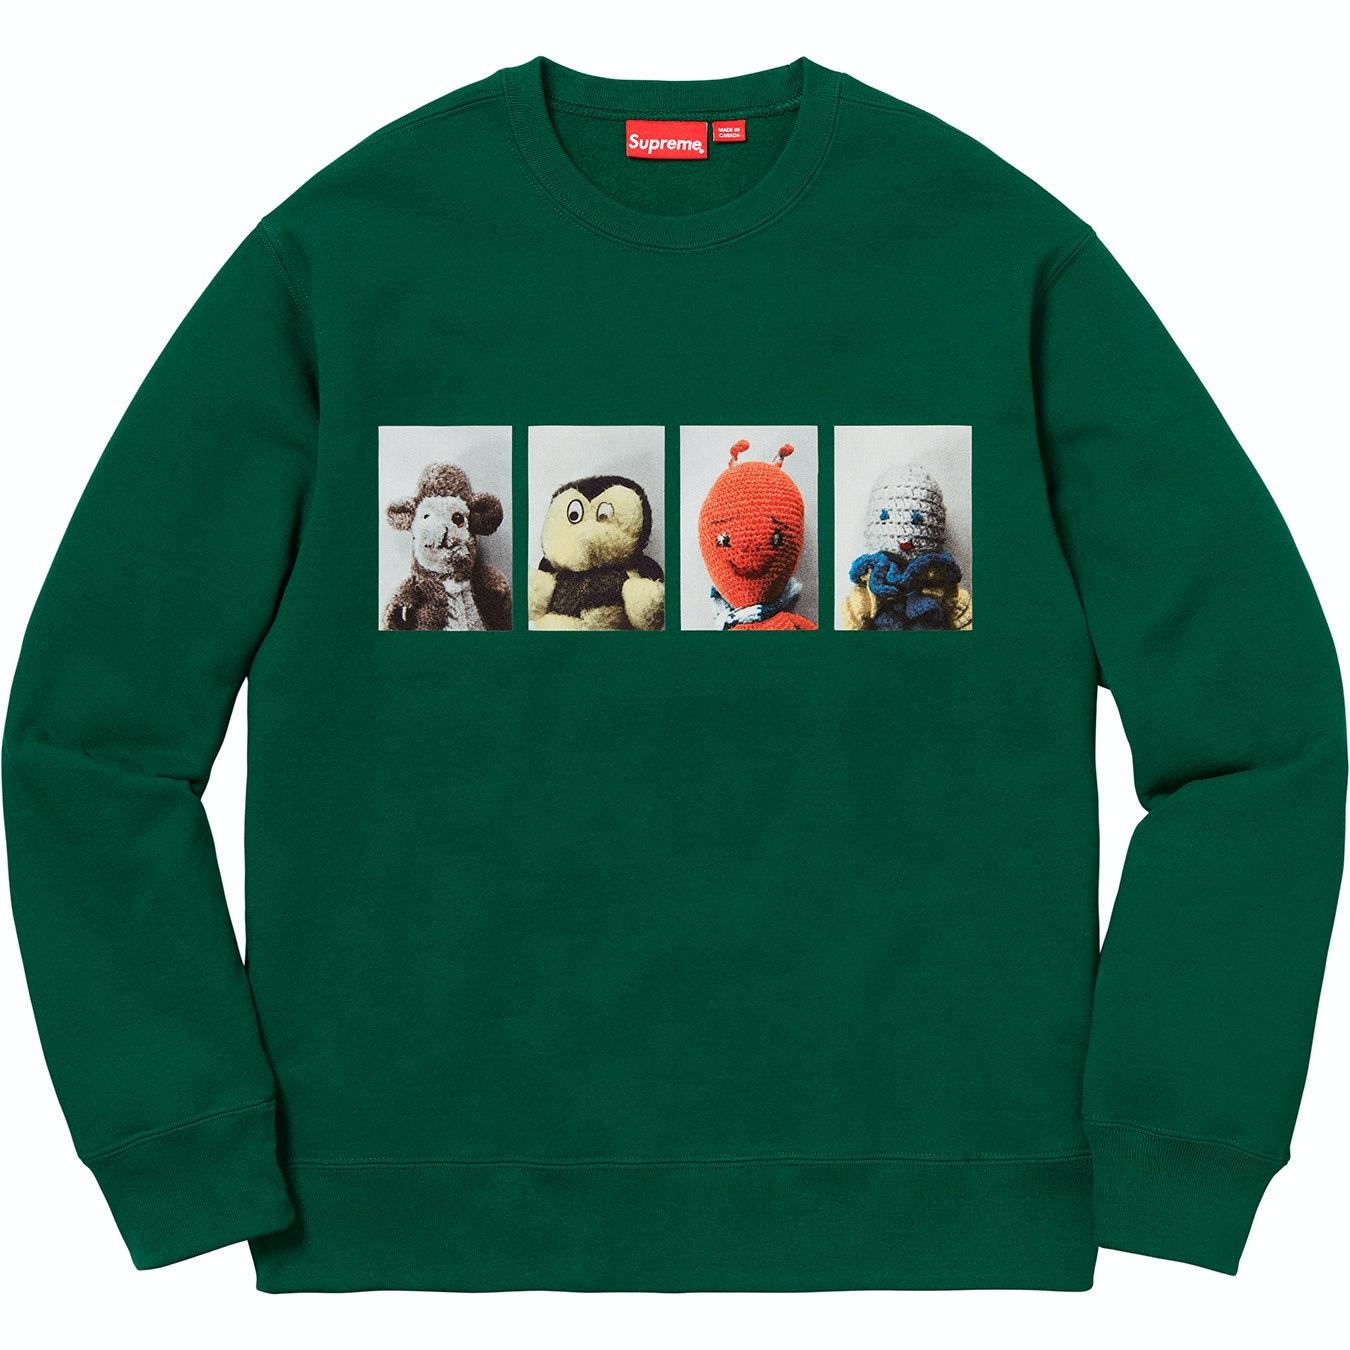 Supreme Mike Kelley AhhYouth! Crewneck Sweatshirt Dark Green